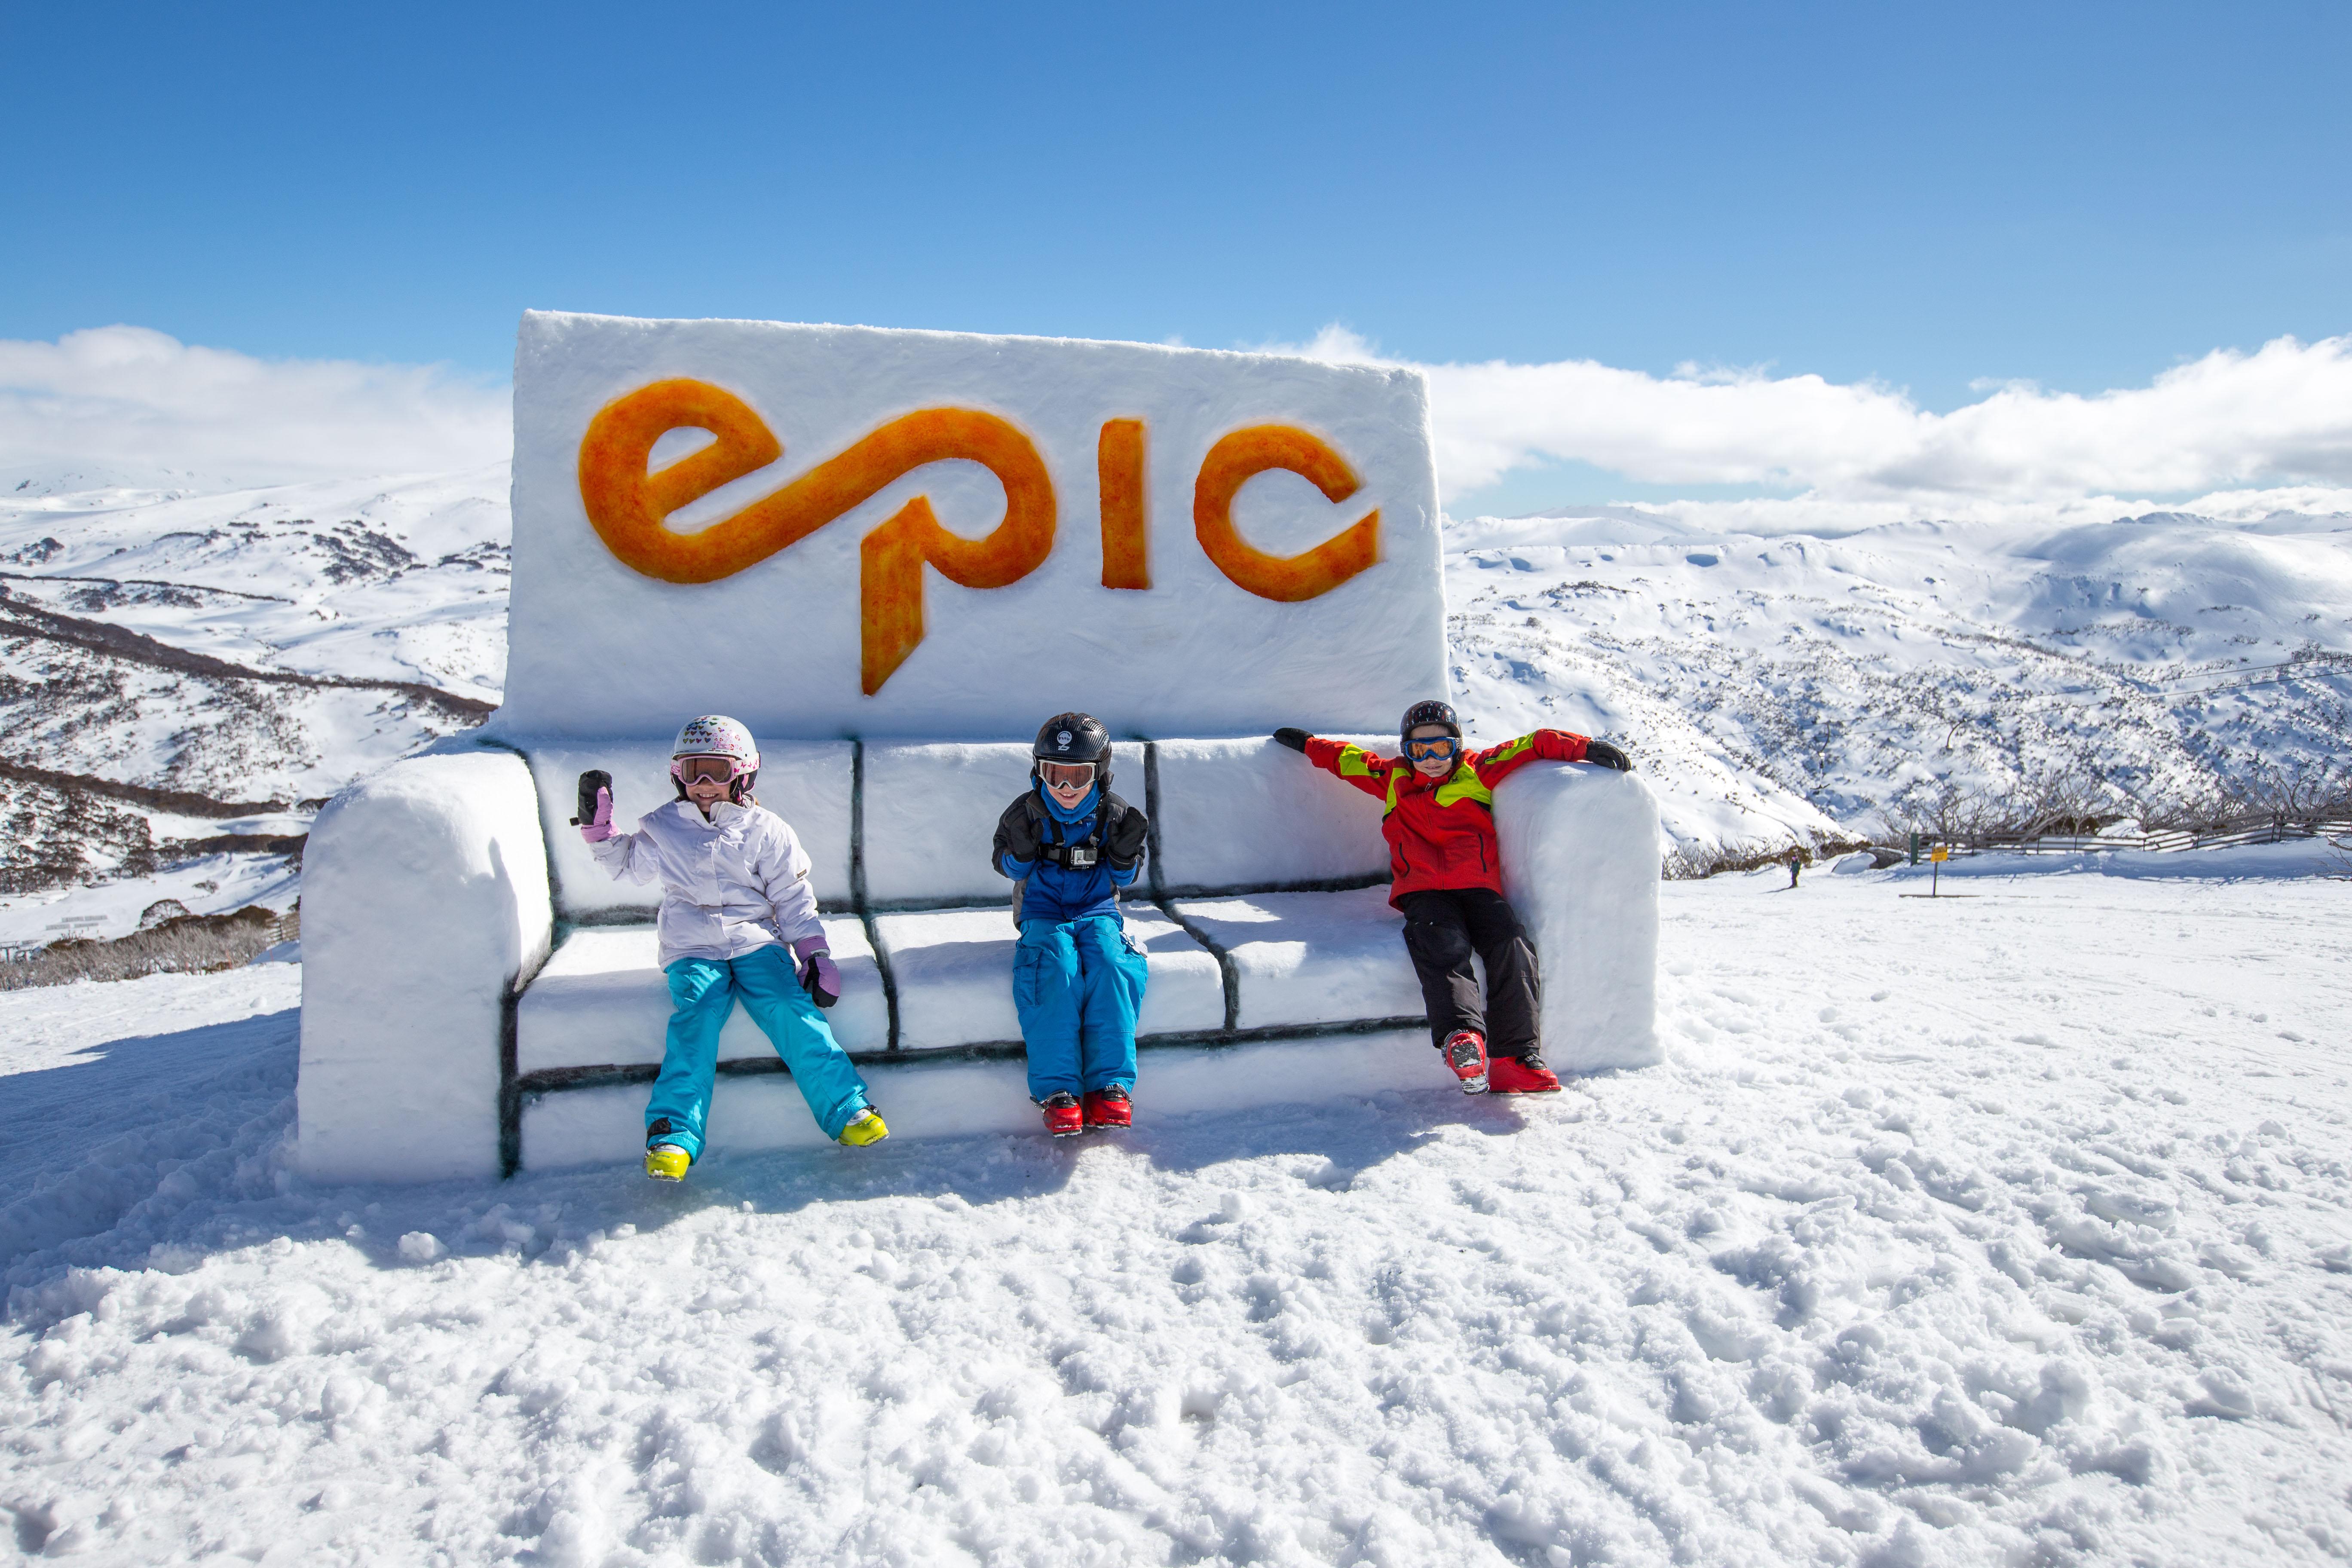 Epic-Australia-Pass-Chair-Guthega